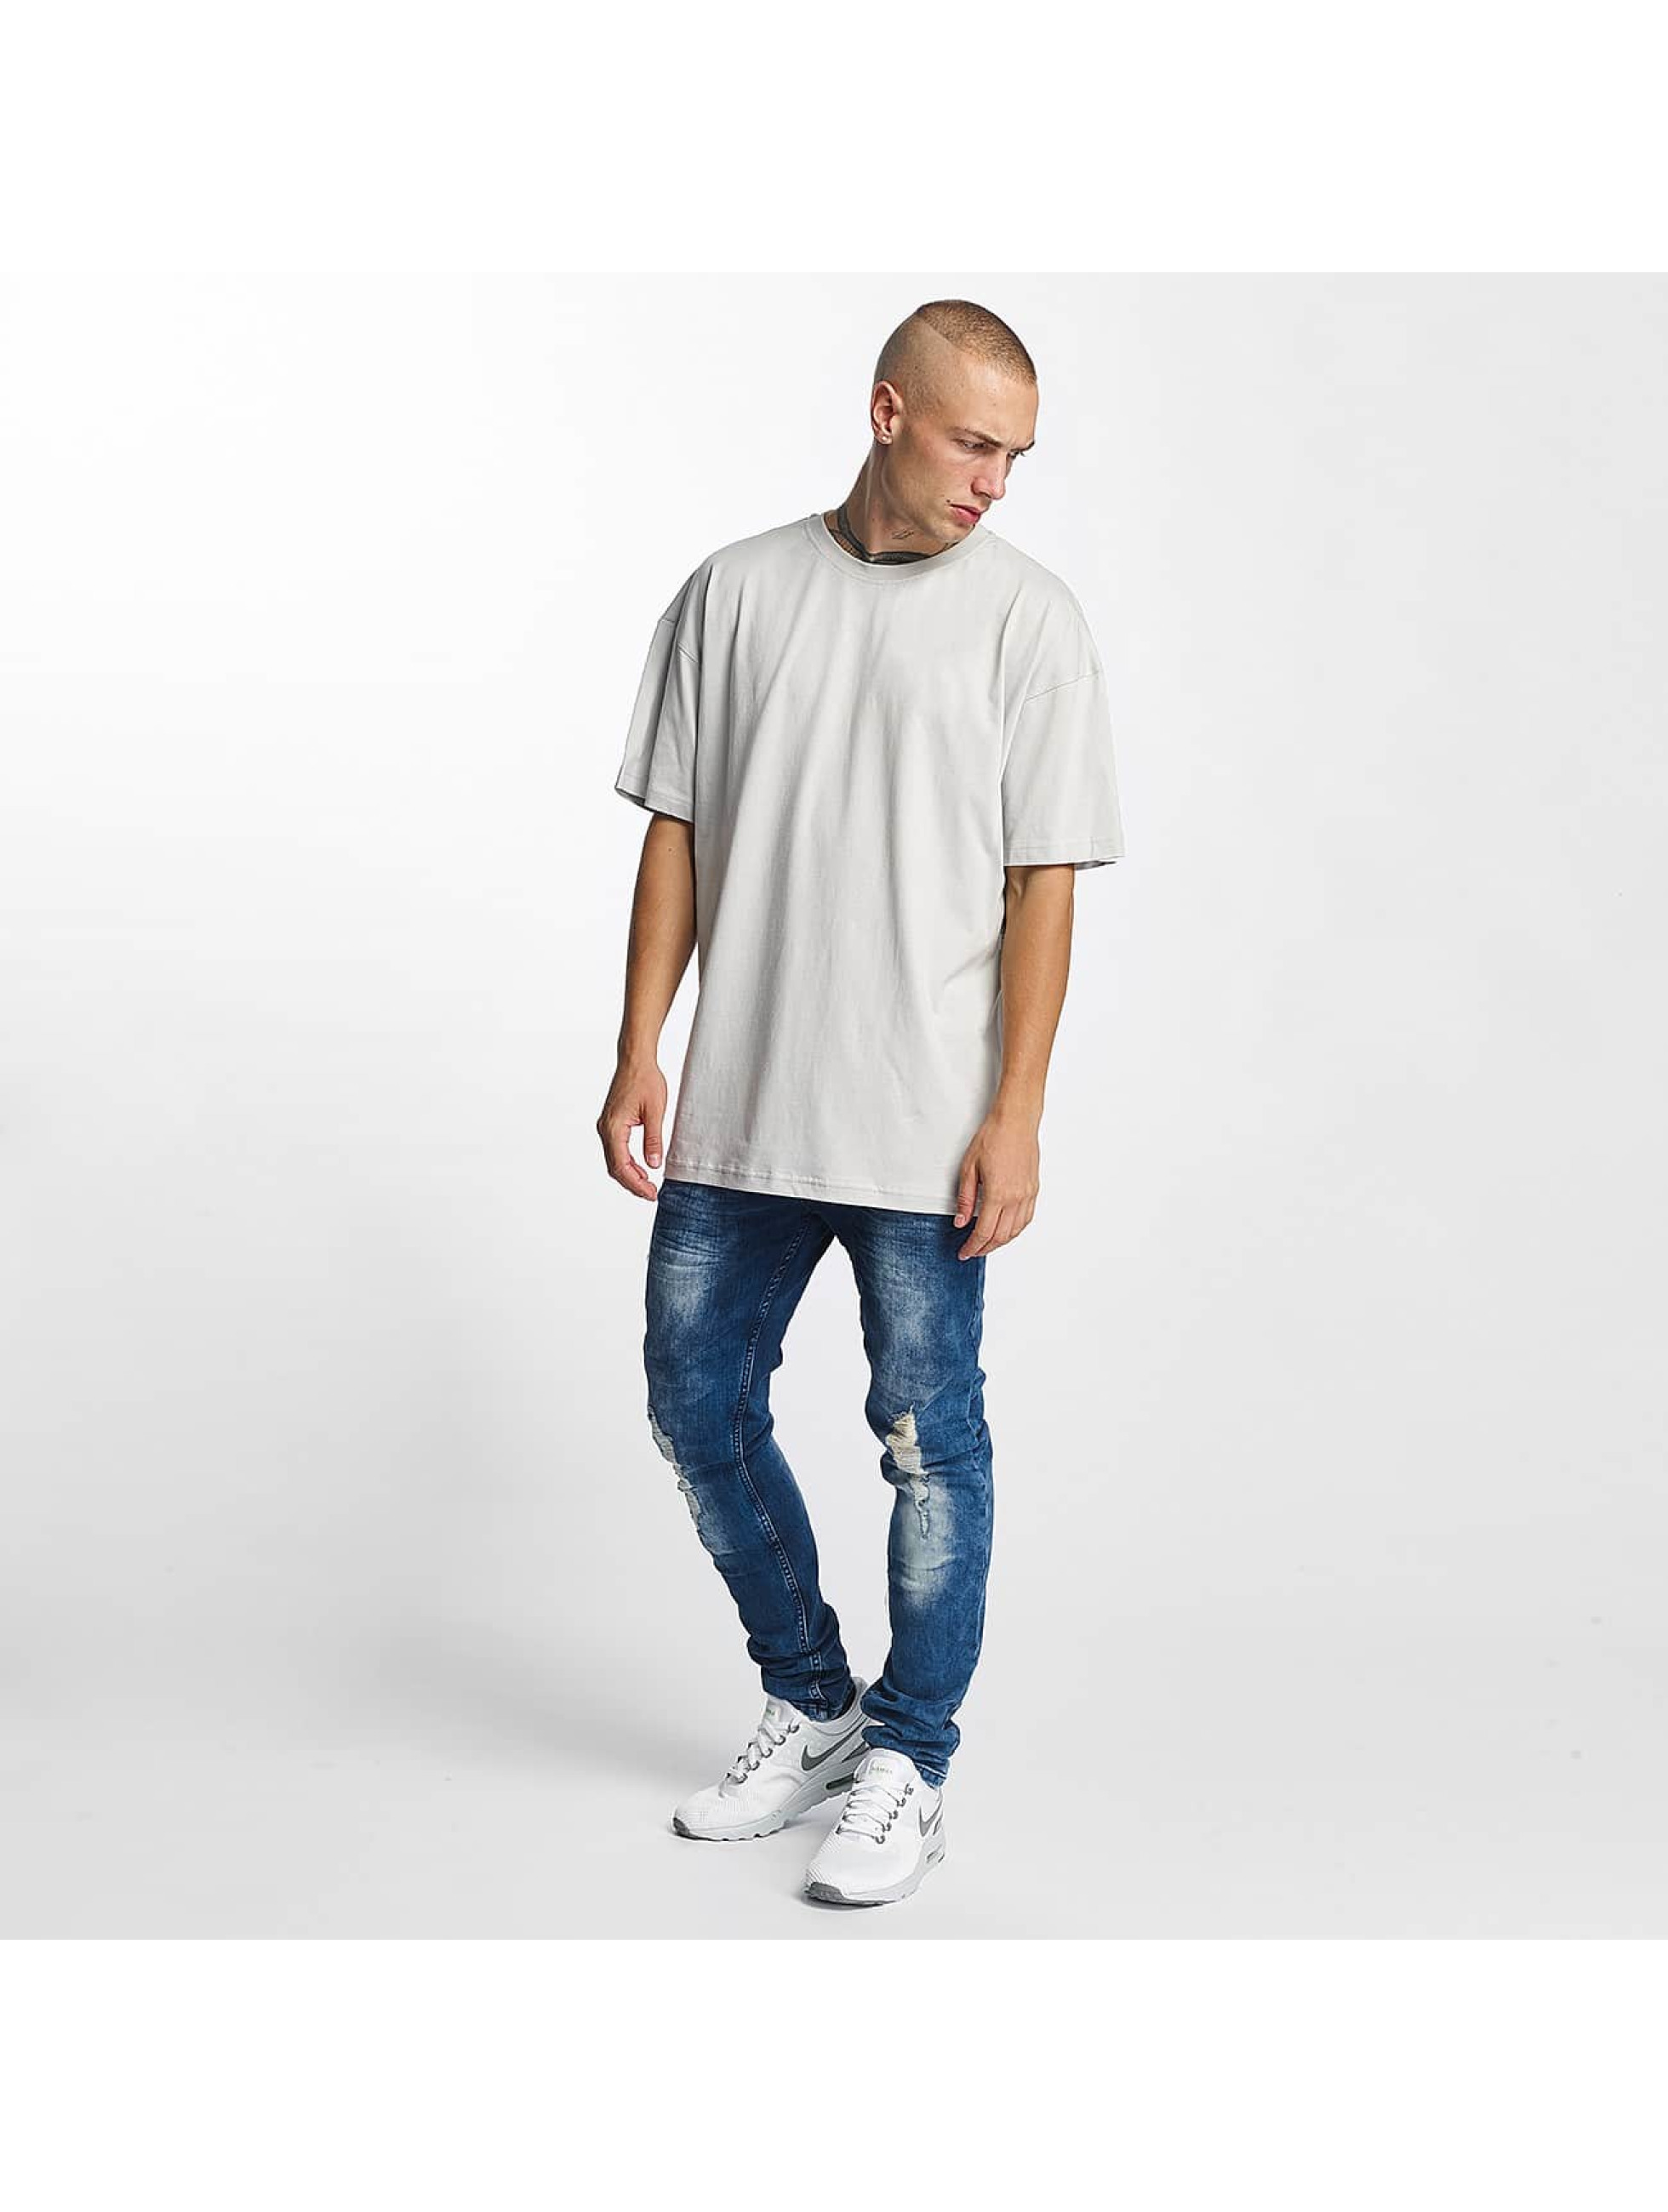 K1X T-Shirt Crest grey